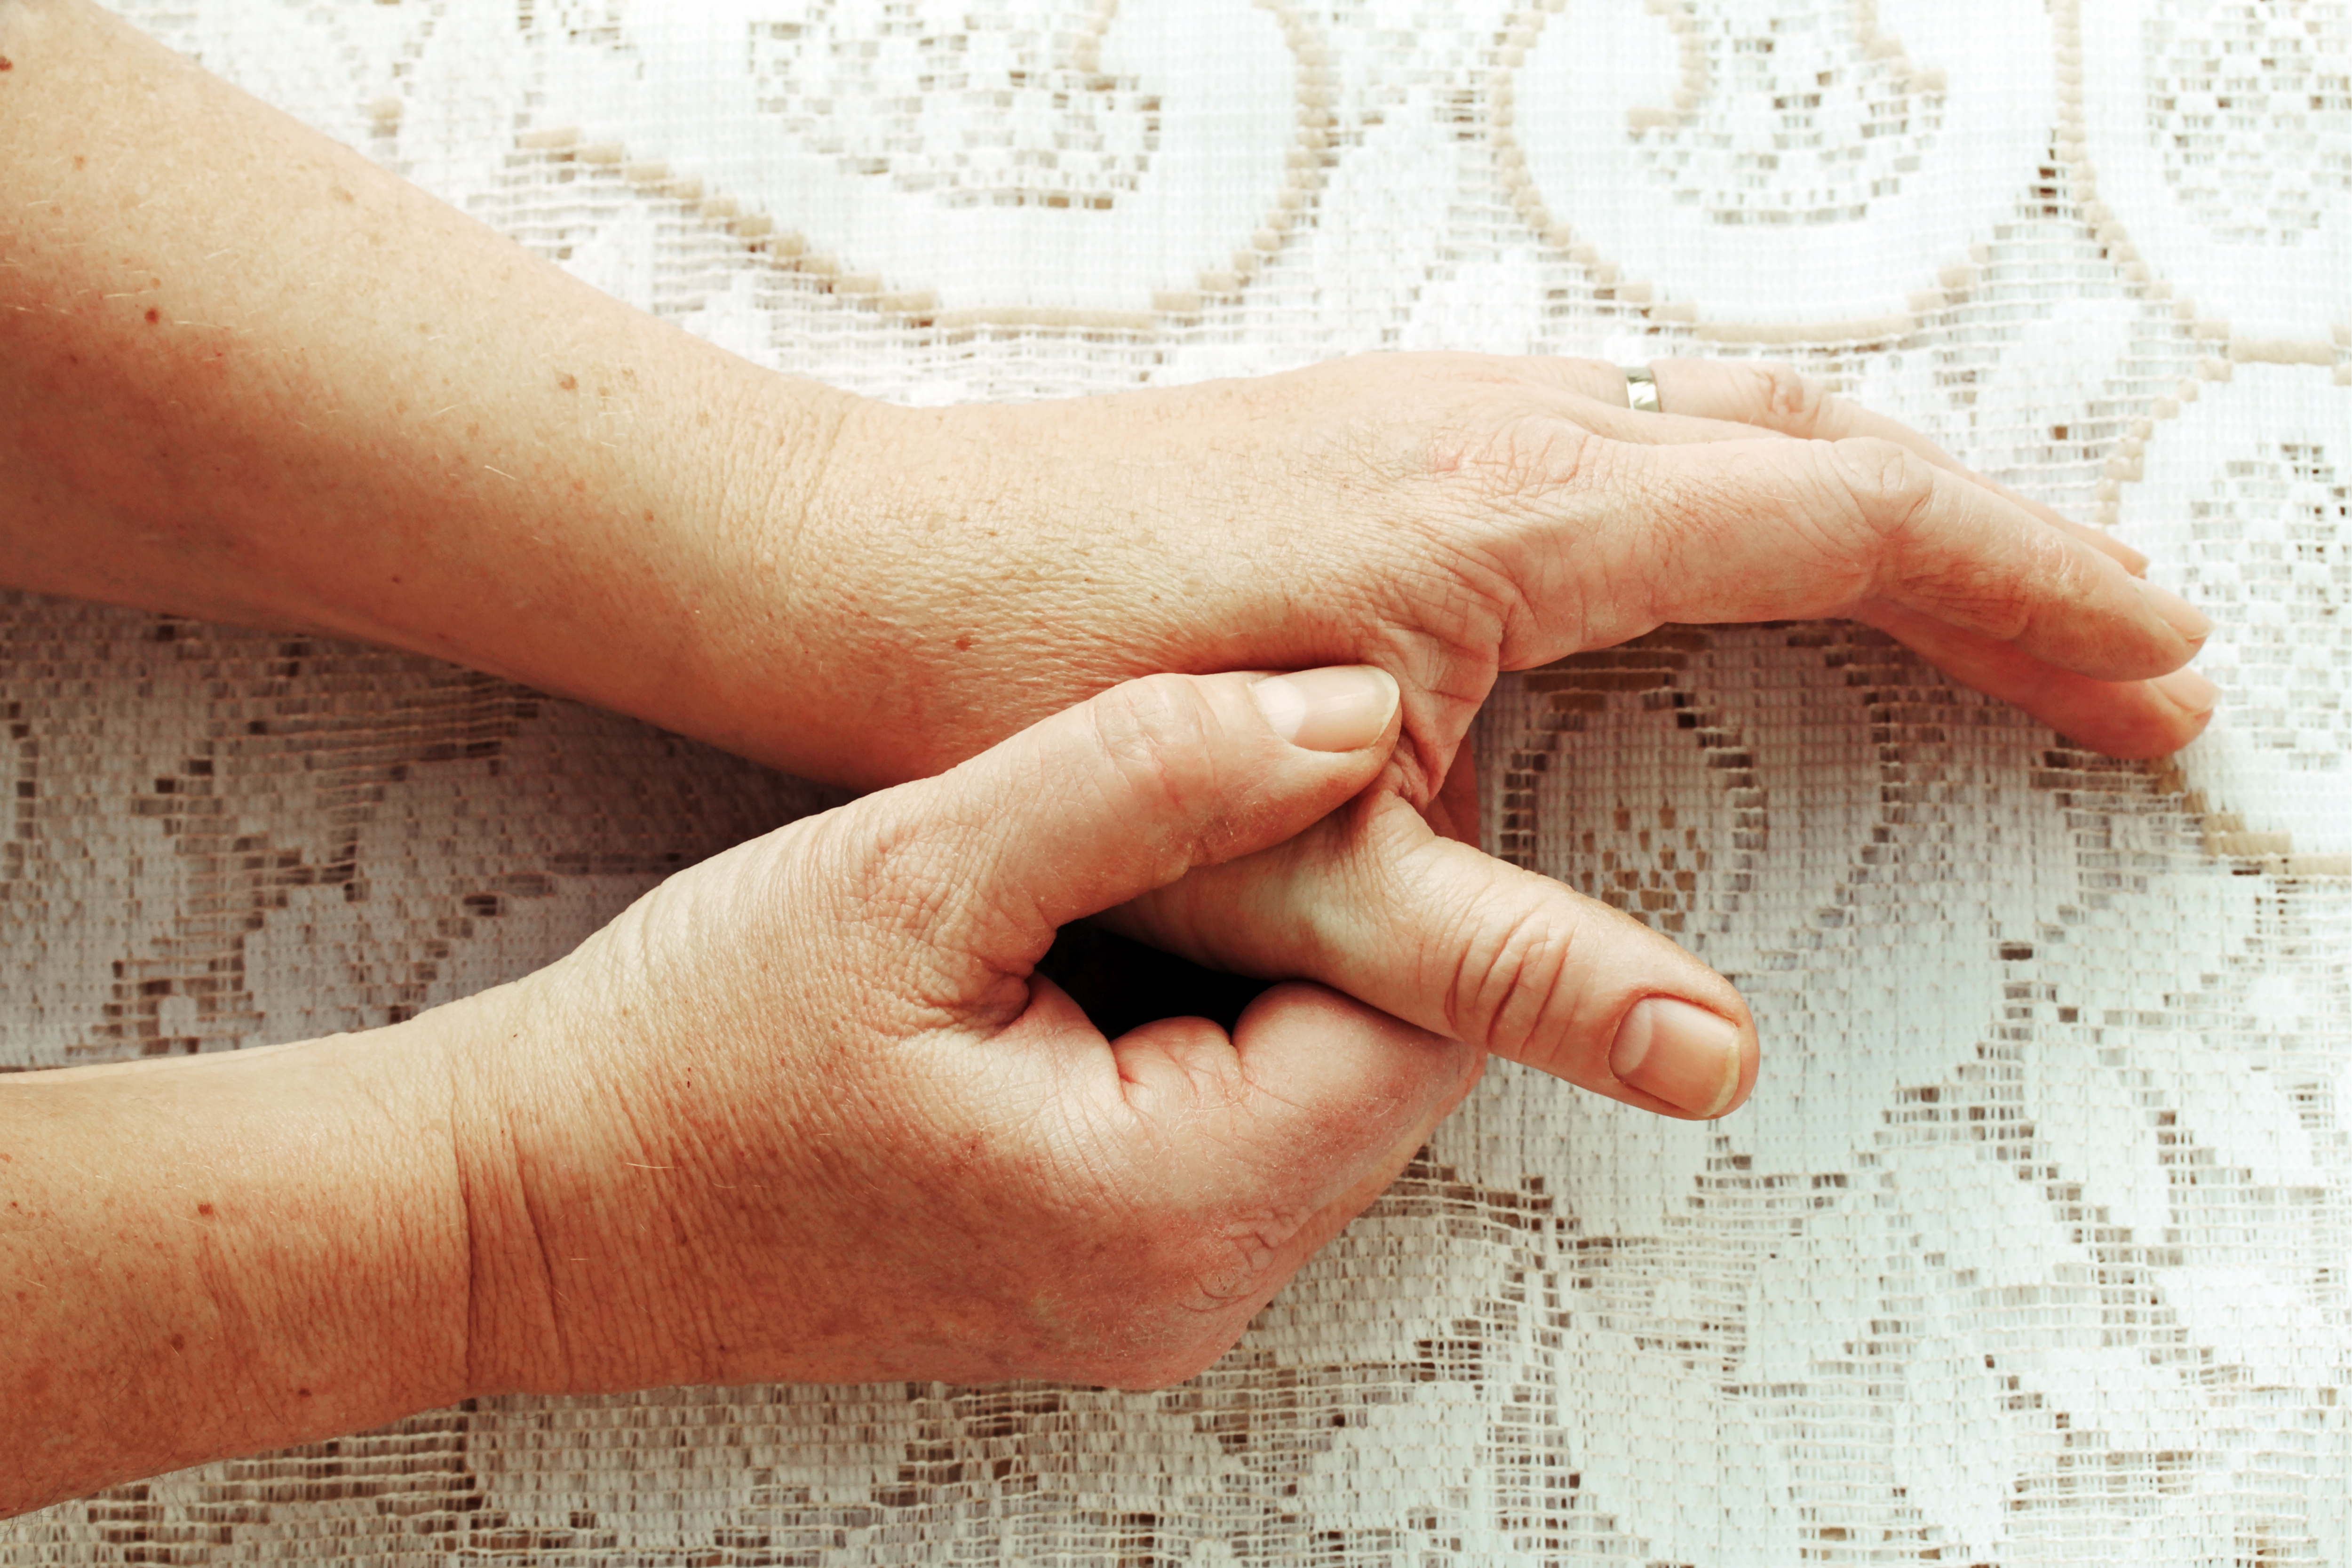 Severe left thumb cramps